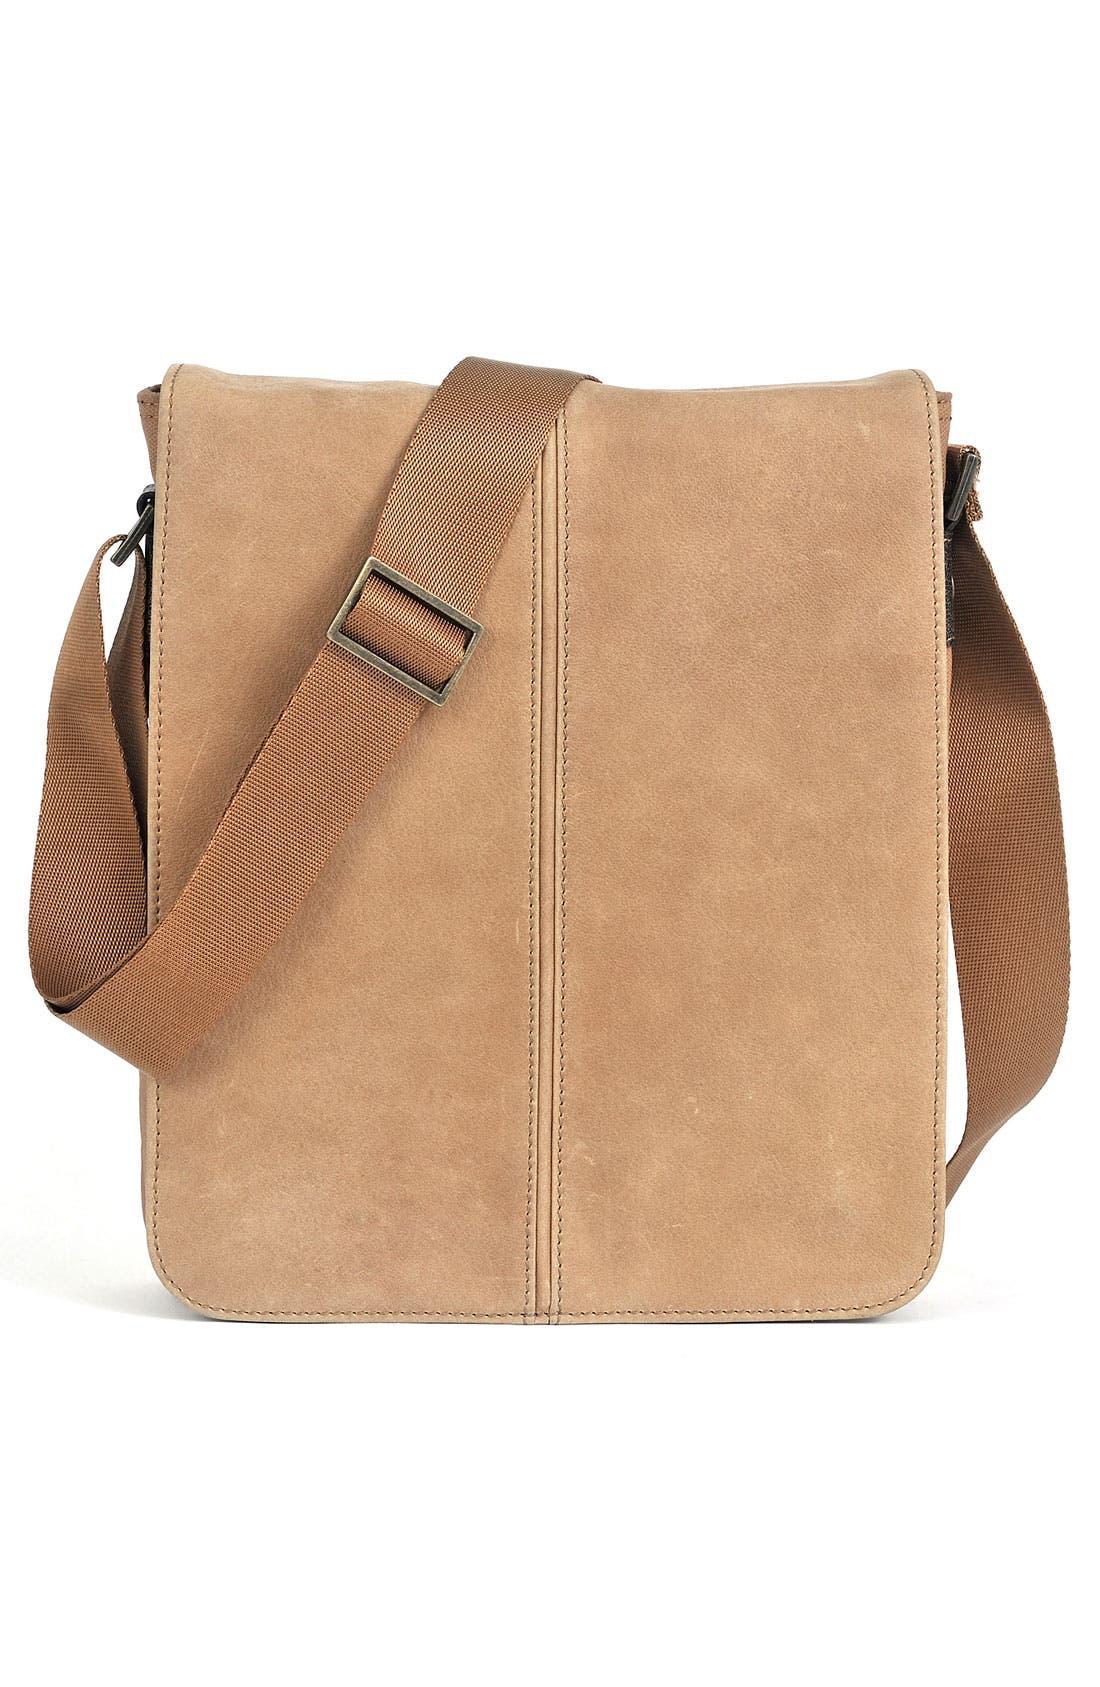 Alternate Image 3  - Boconi 'Leon Mailbag' Calfskin Leather Crossbody Bag